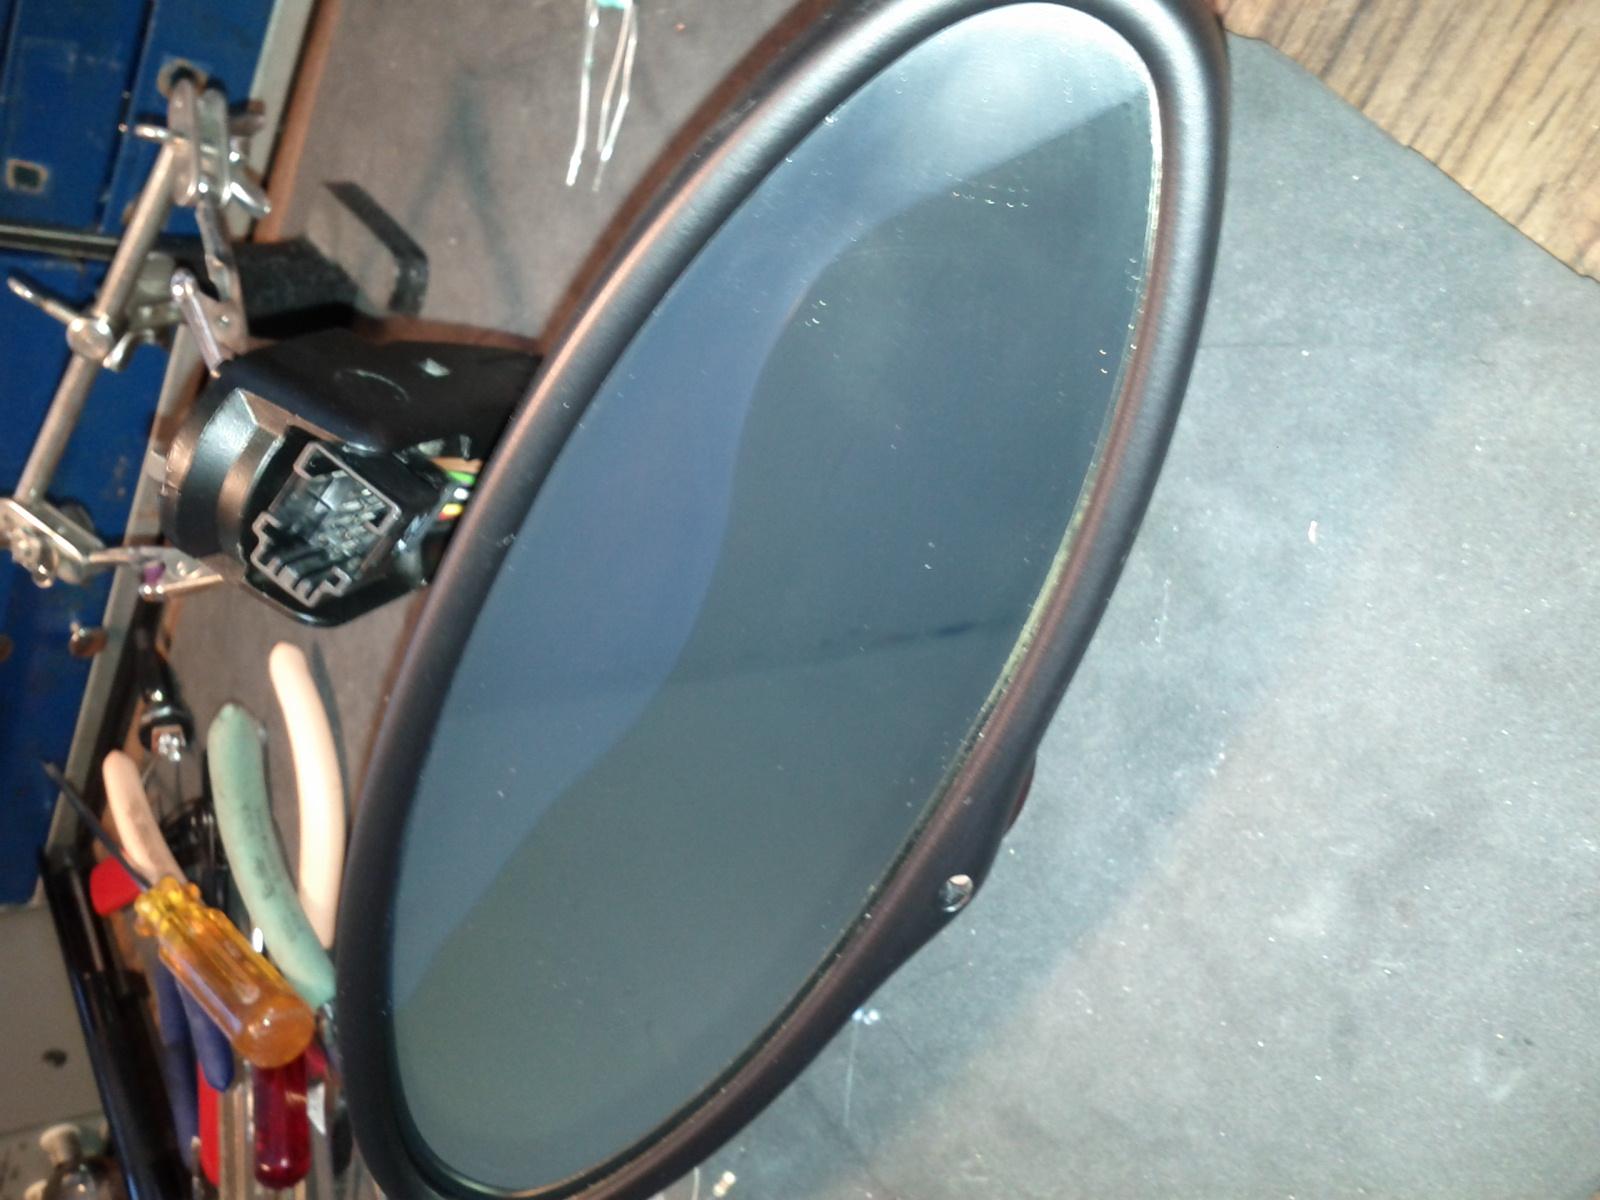 Mirror Repair Image And Description Imageload Co